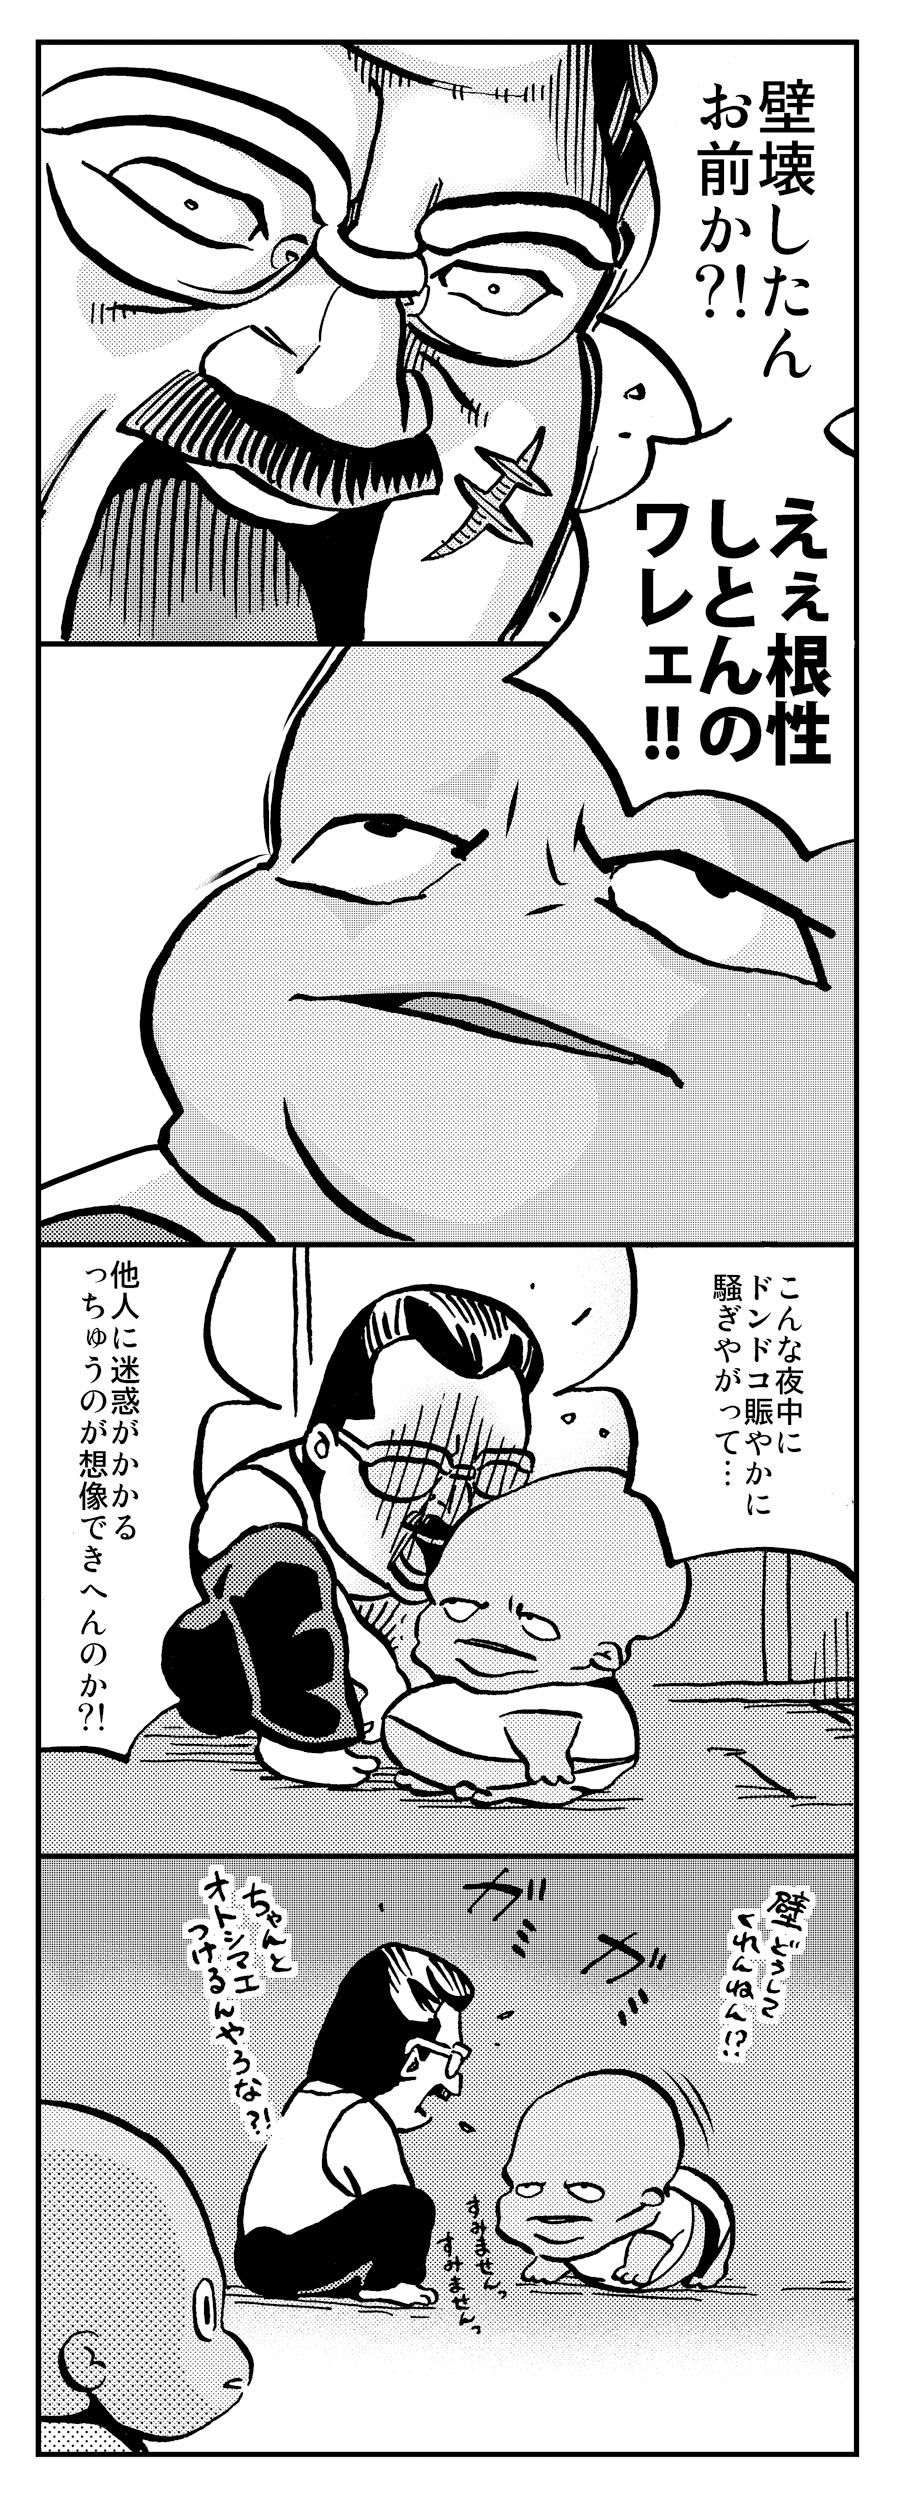 hippseijin_manga_02_03